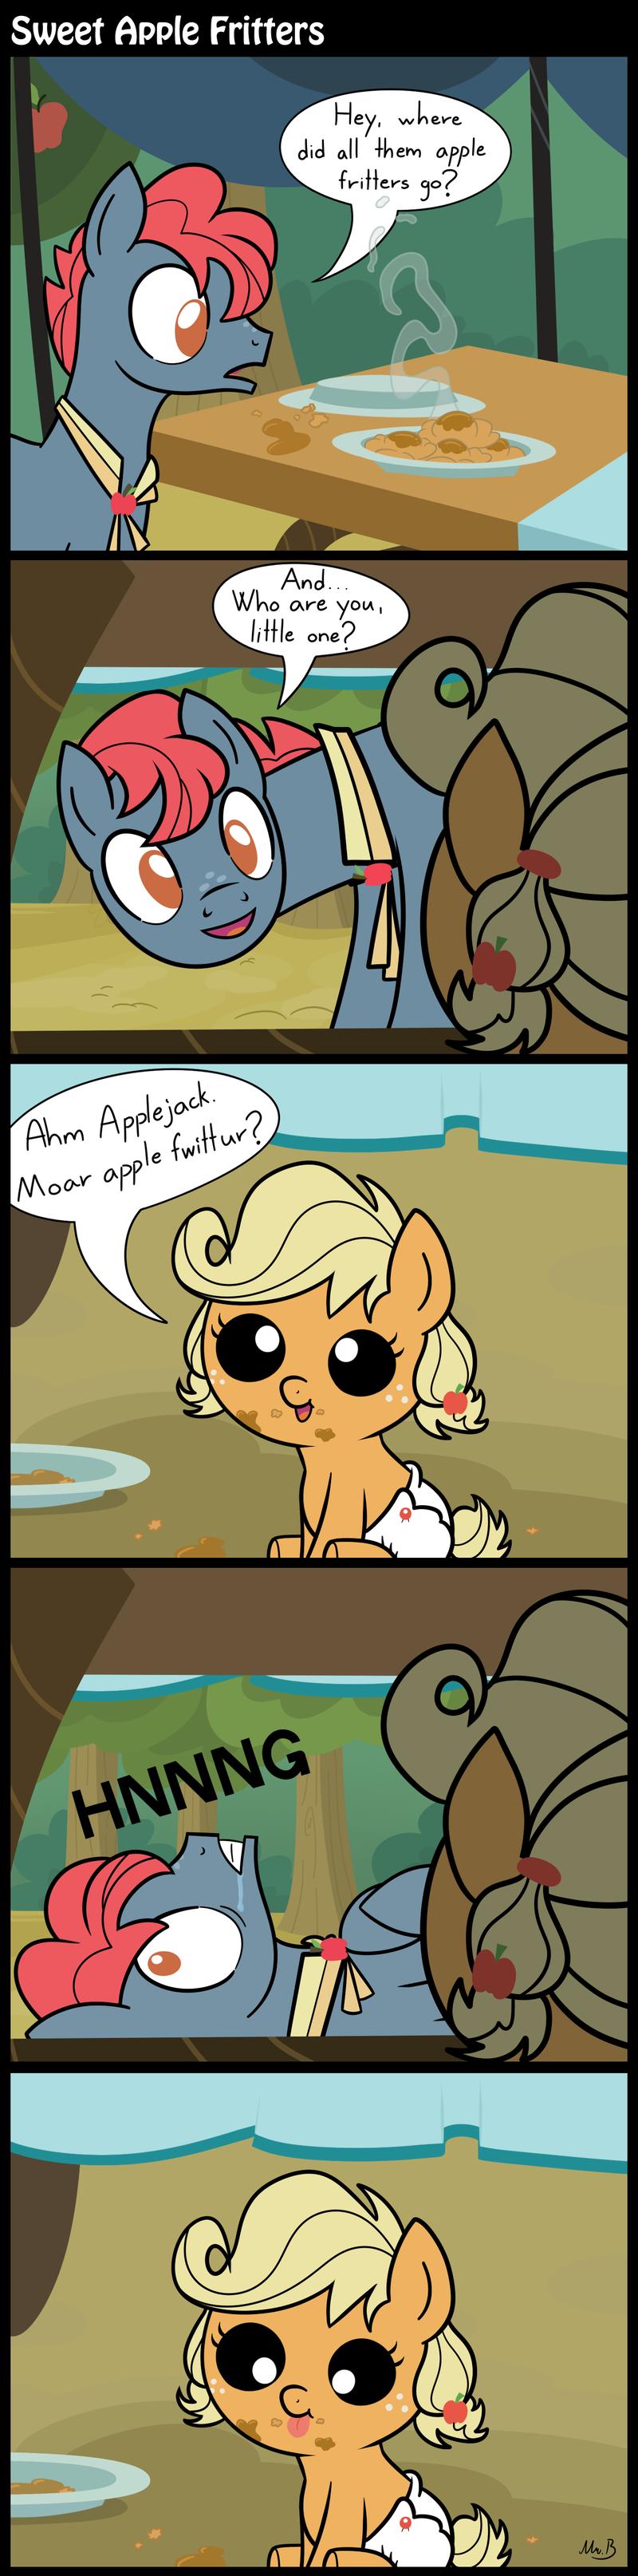 Sweet Apple Fritters. . Sweet Apple Fritters. There goes my left heart. ponies comic